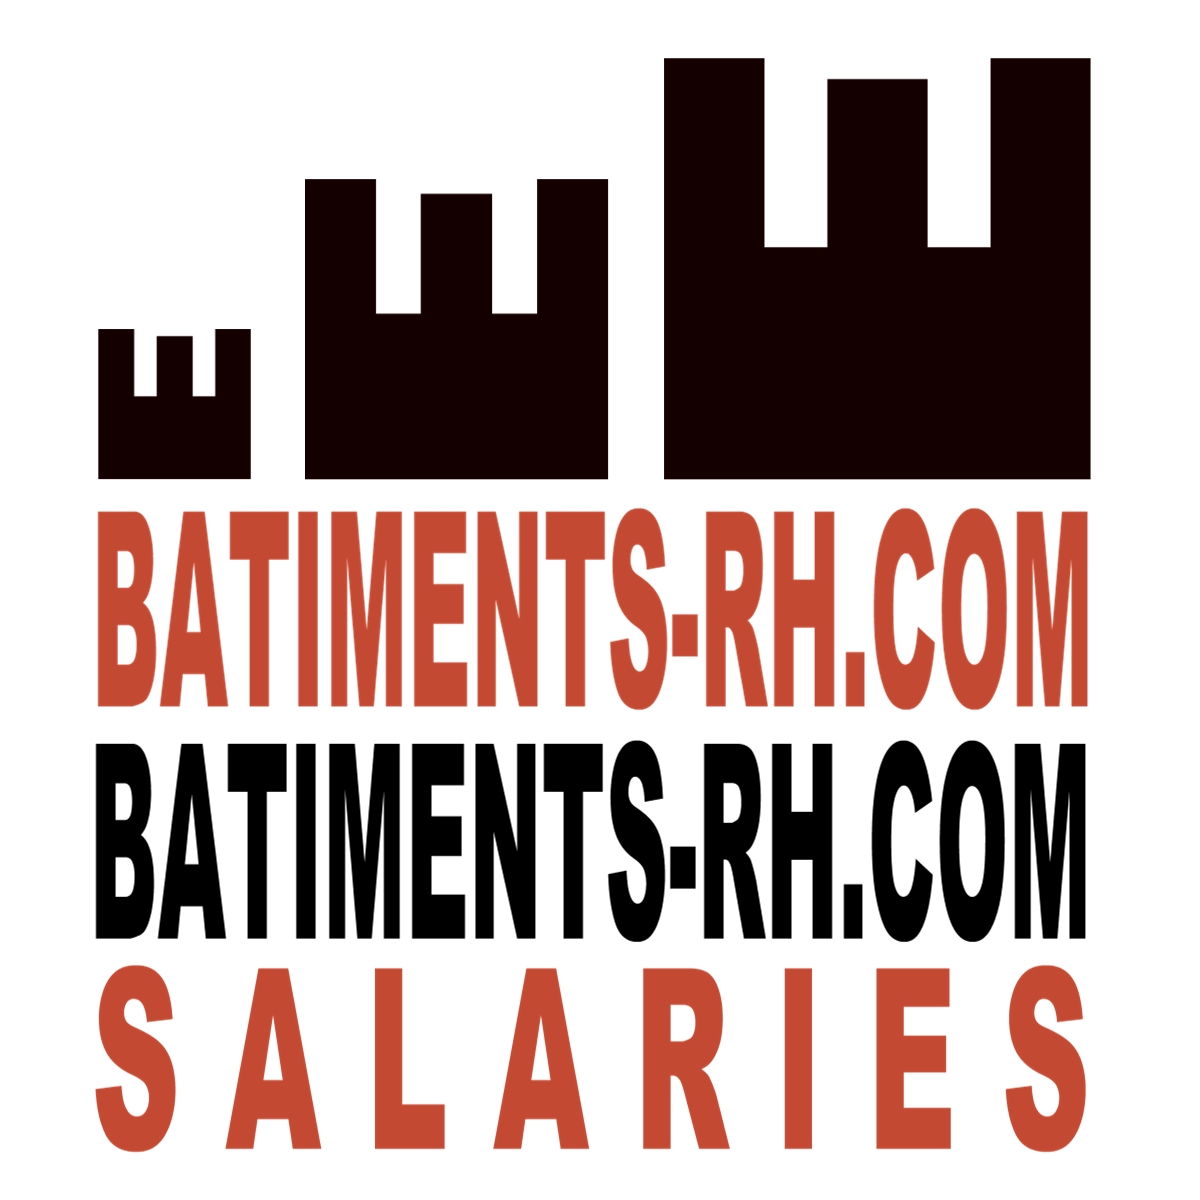 BATIMENTS-RH